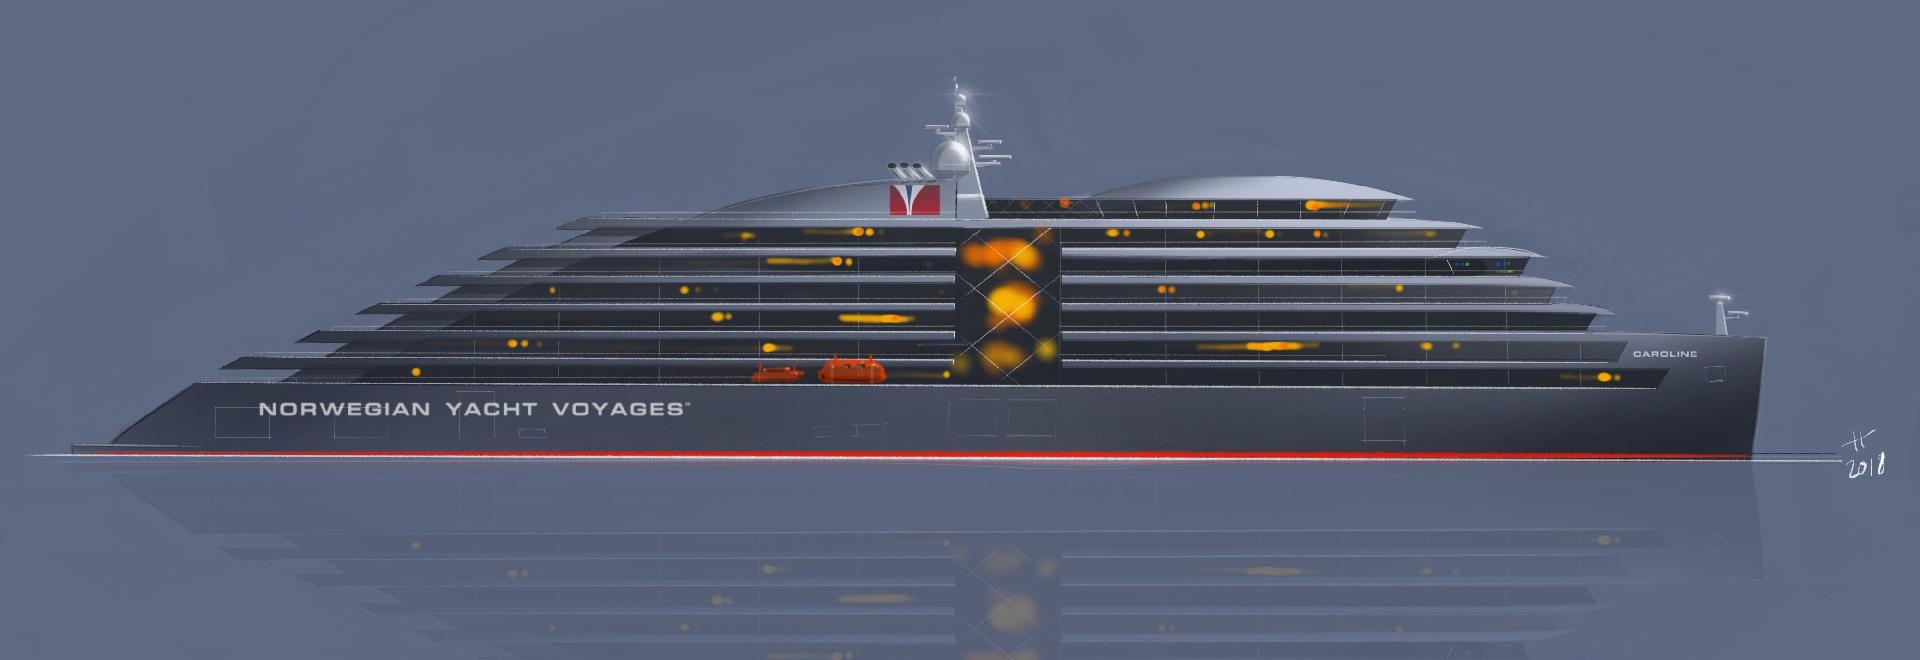 Viaggi norvegesi dell'yacht